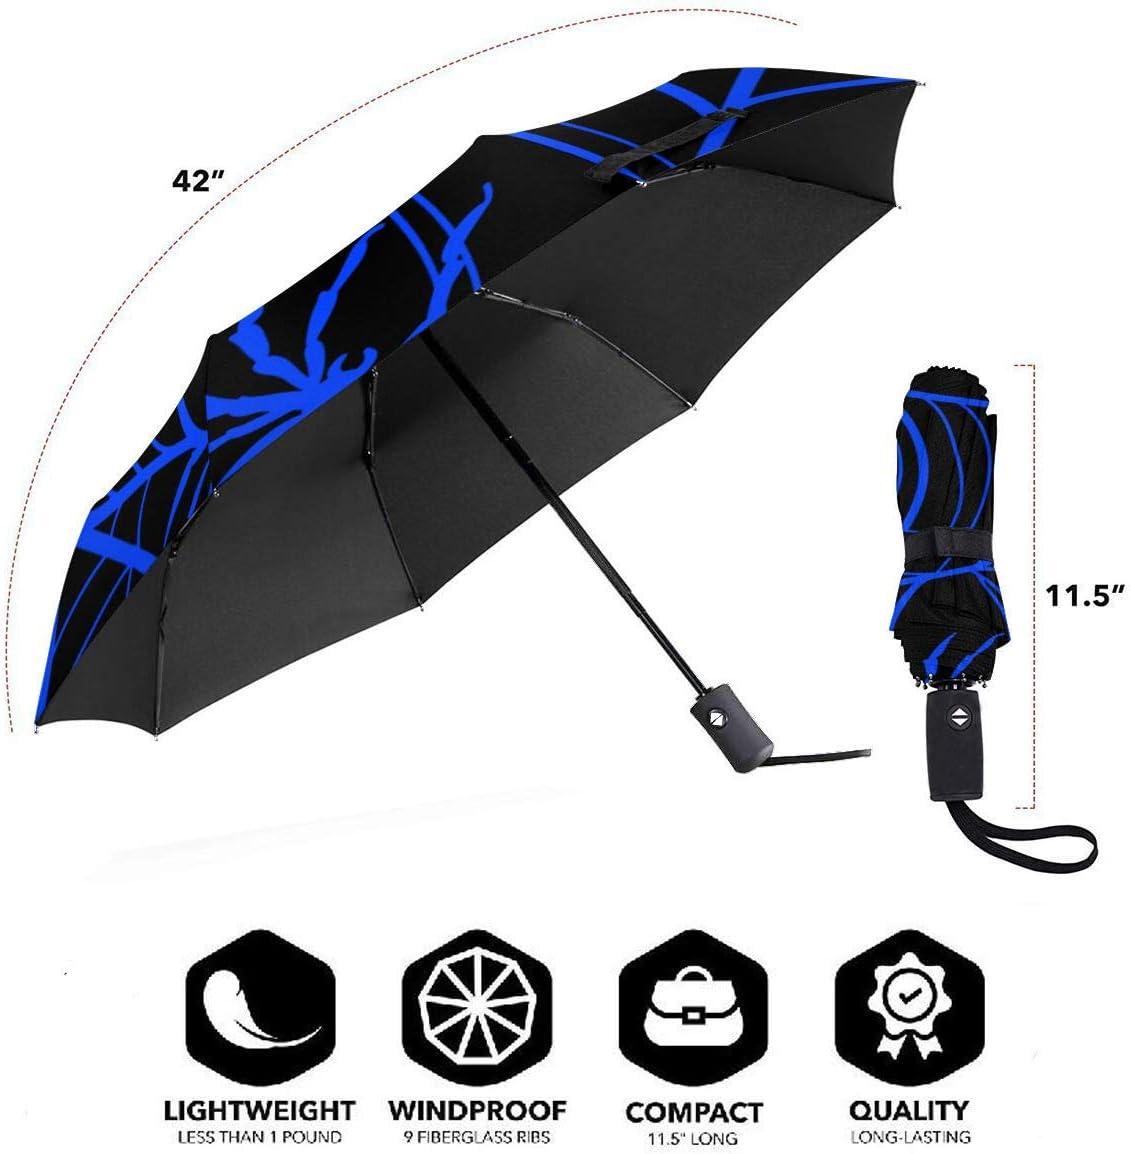 Spider Web Glow In The Dark Automatic Tri-Fold Umbrella Parasol Sun Umbrella Sunshade